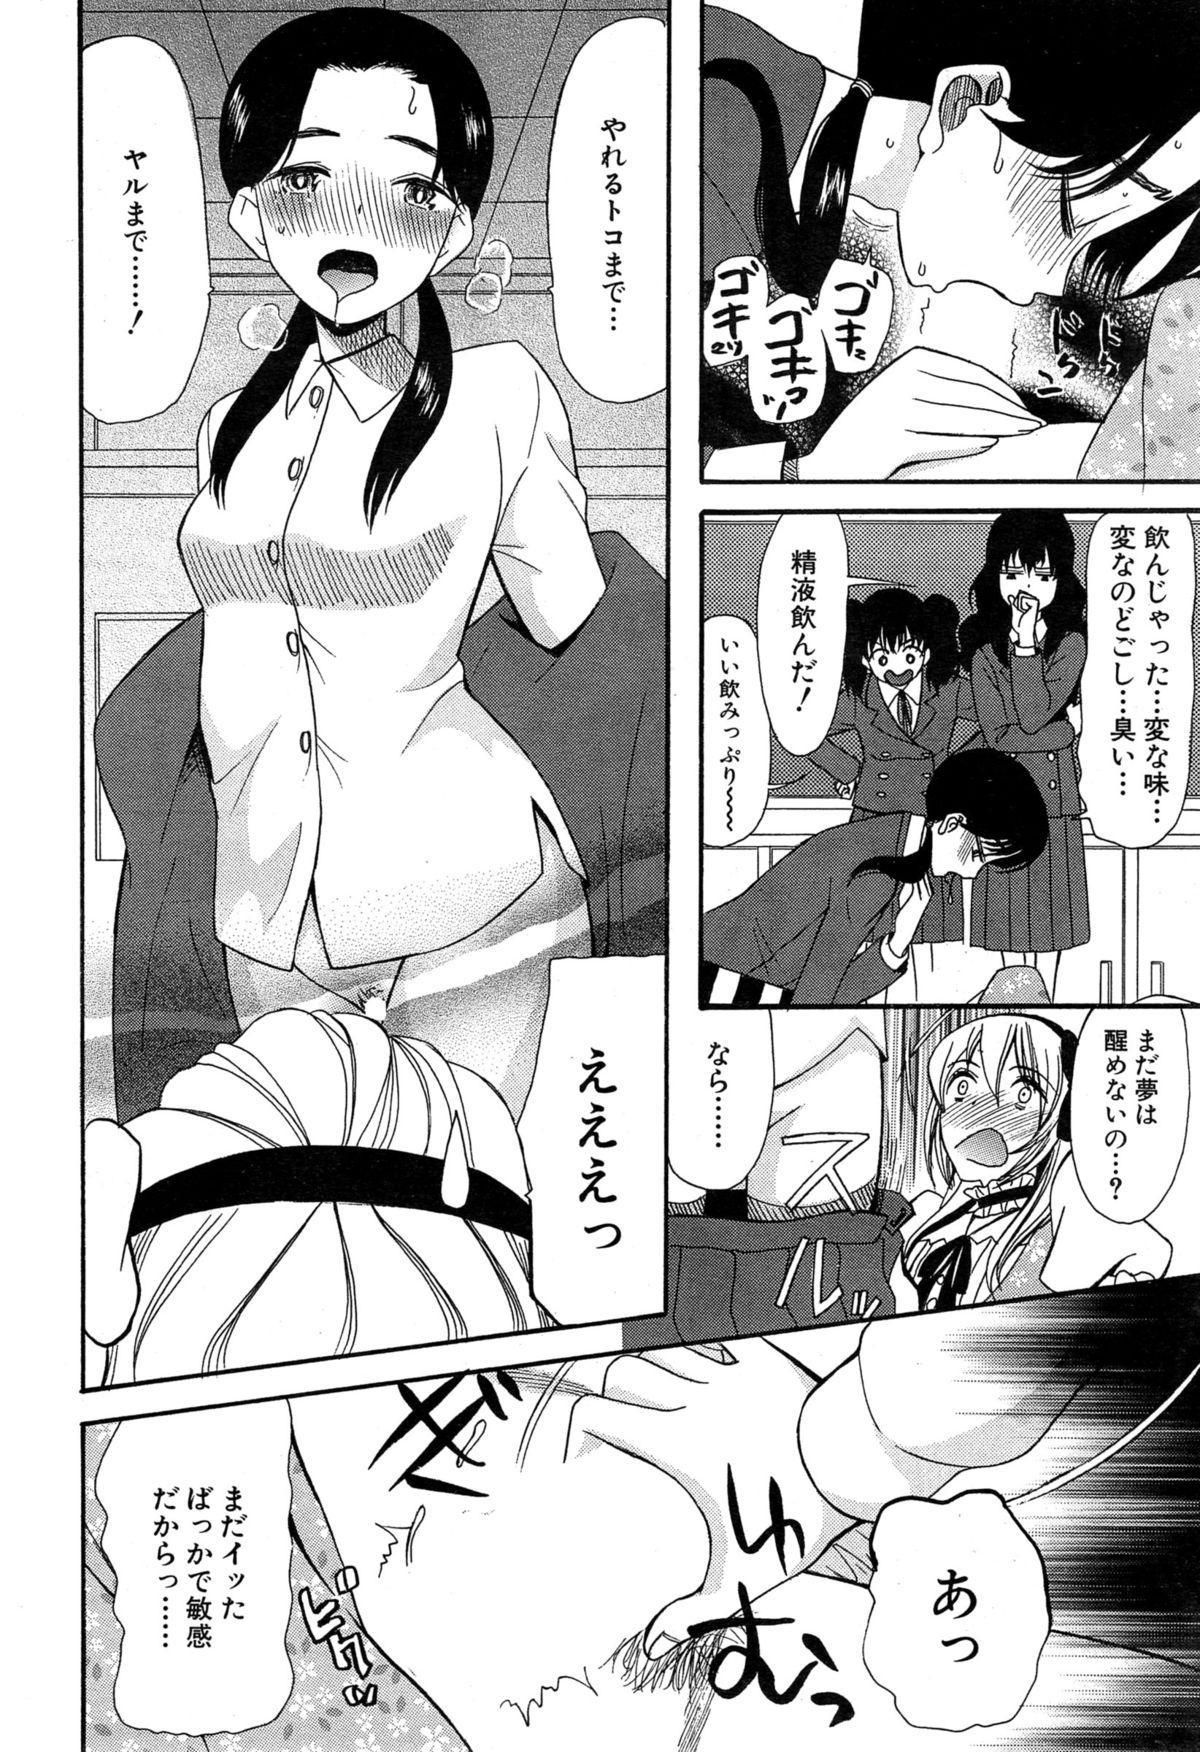 Kawaiku Natte Omocha ni Natte 47